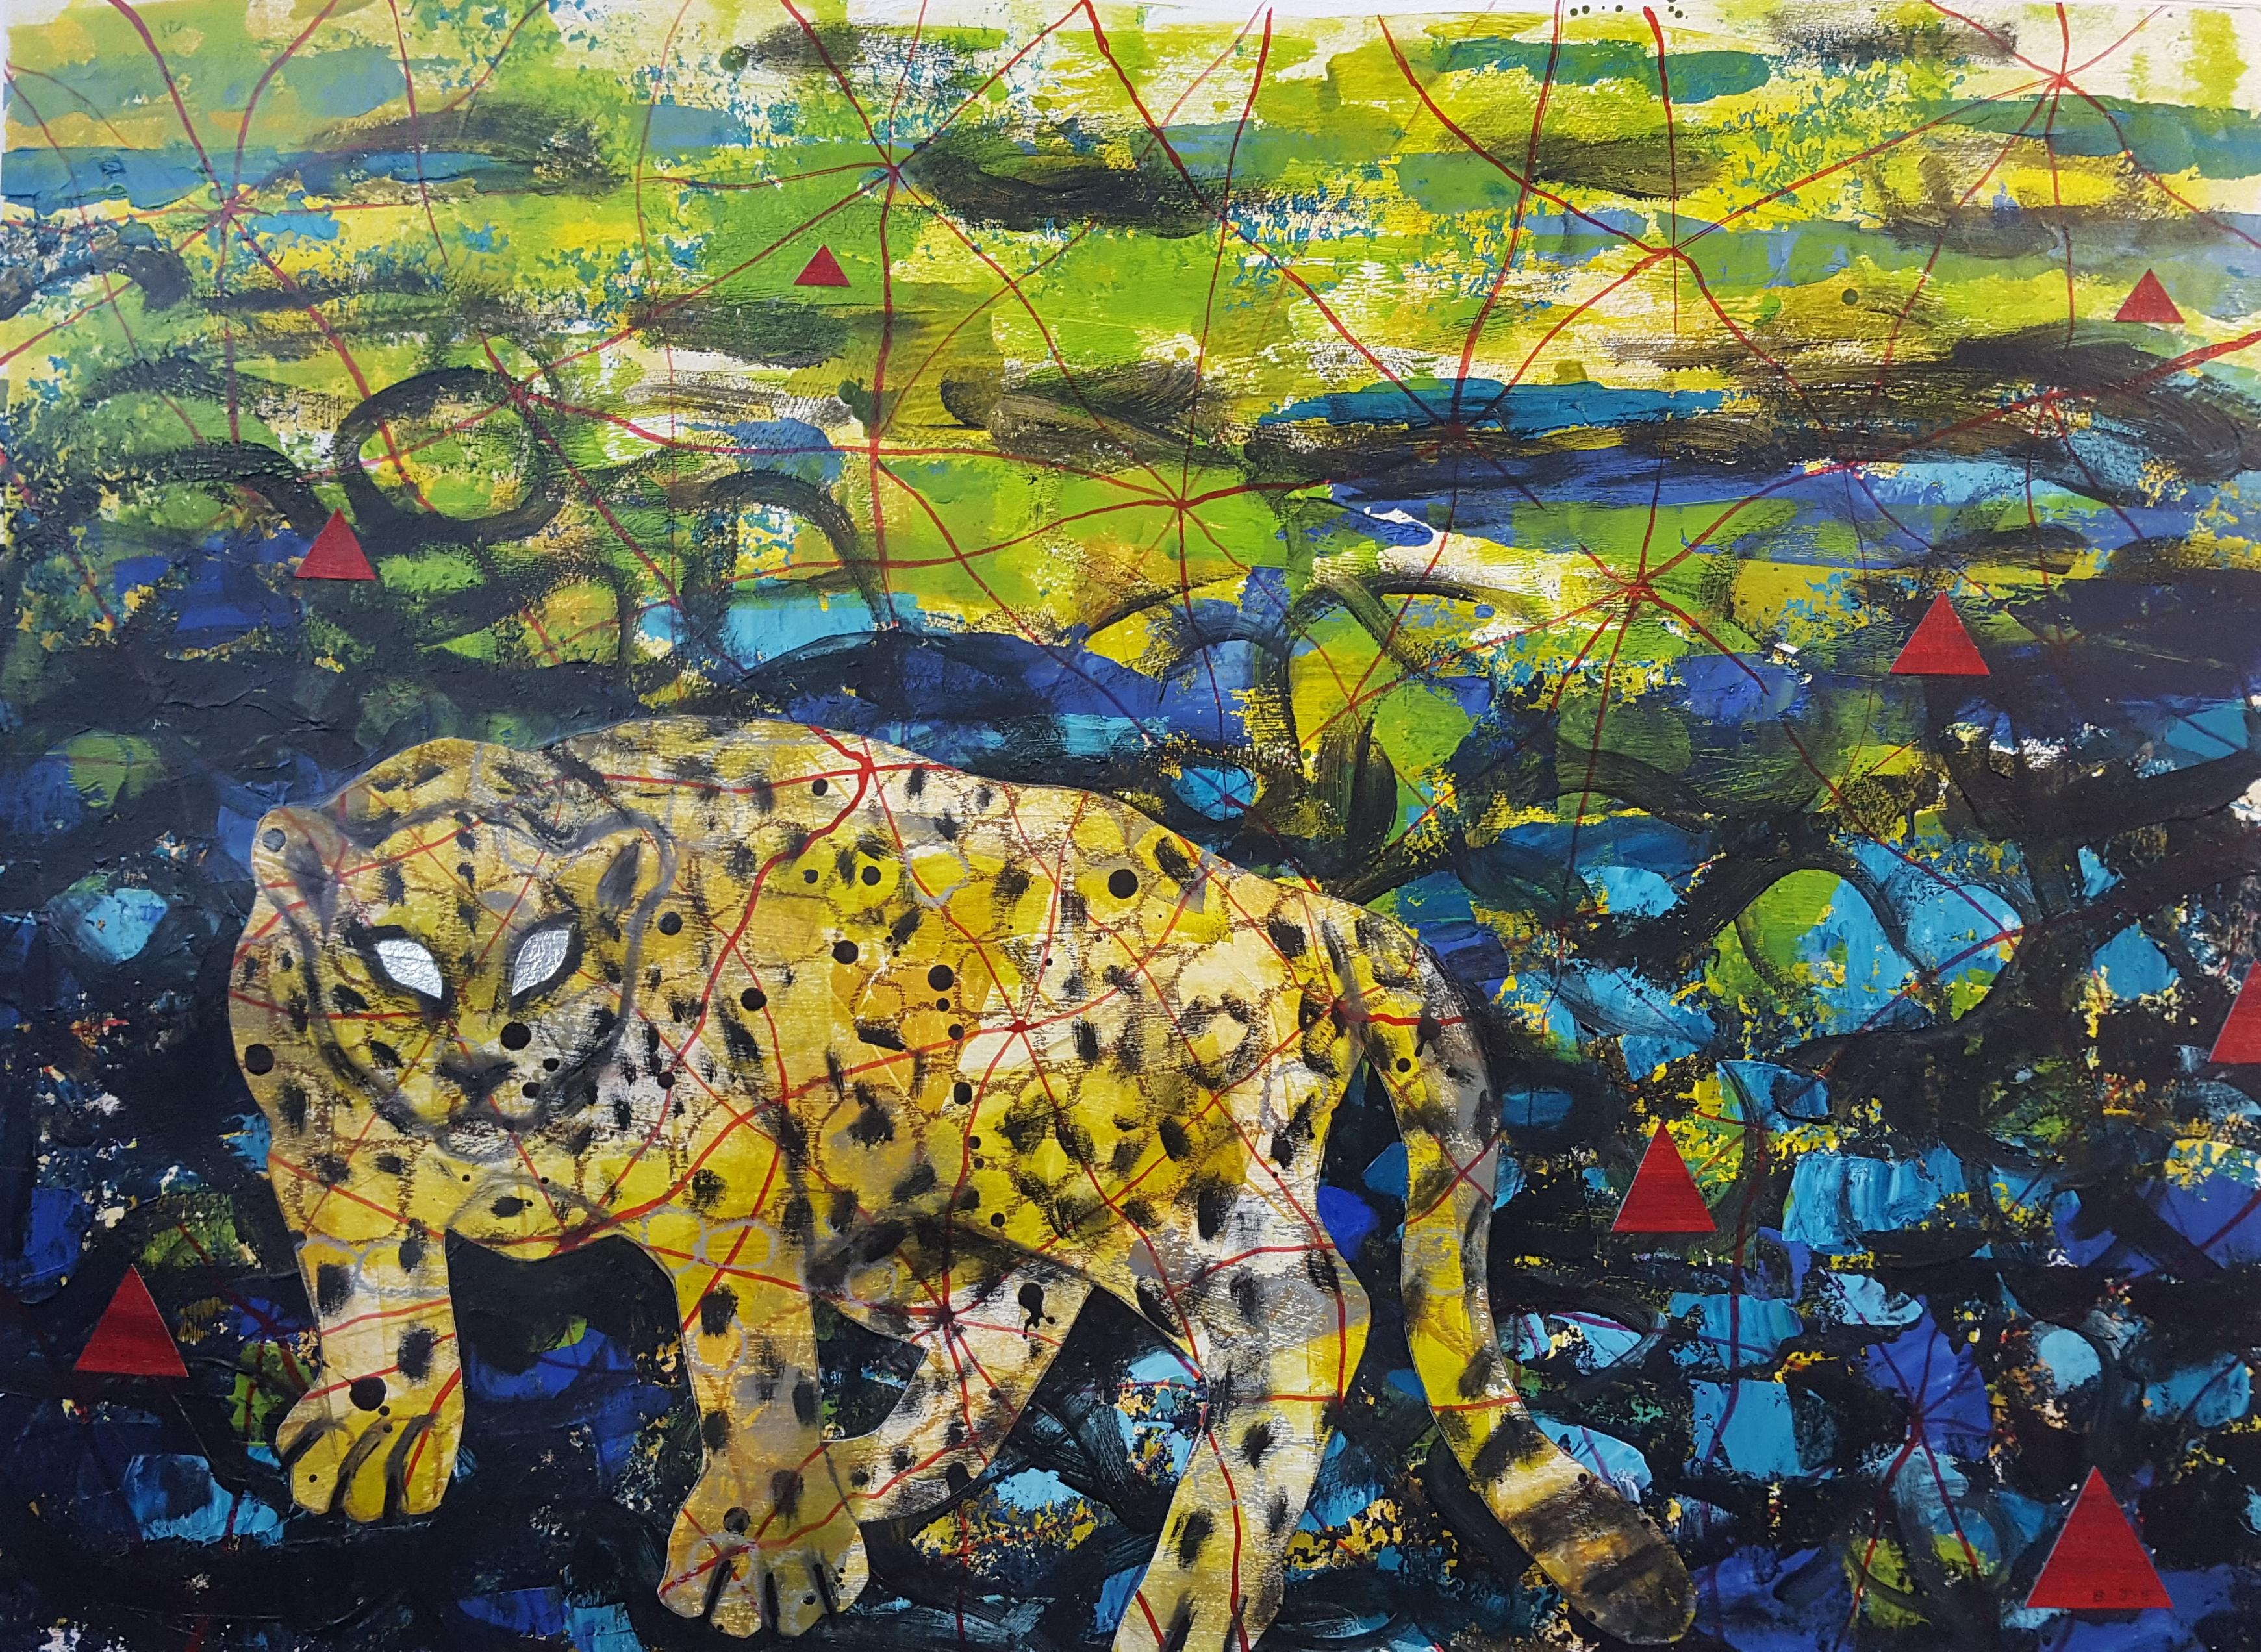 Selfportrait - I Am Jaguar